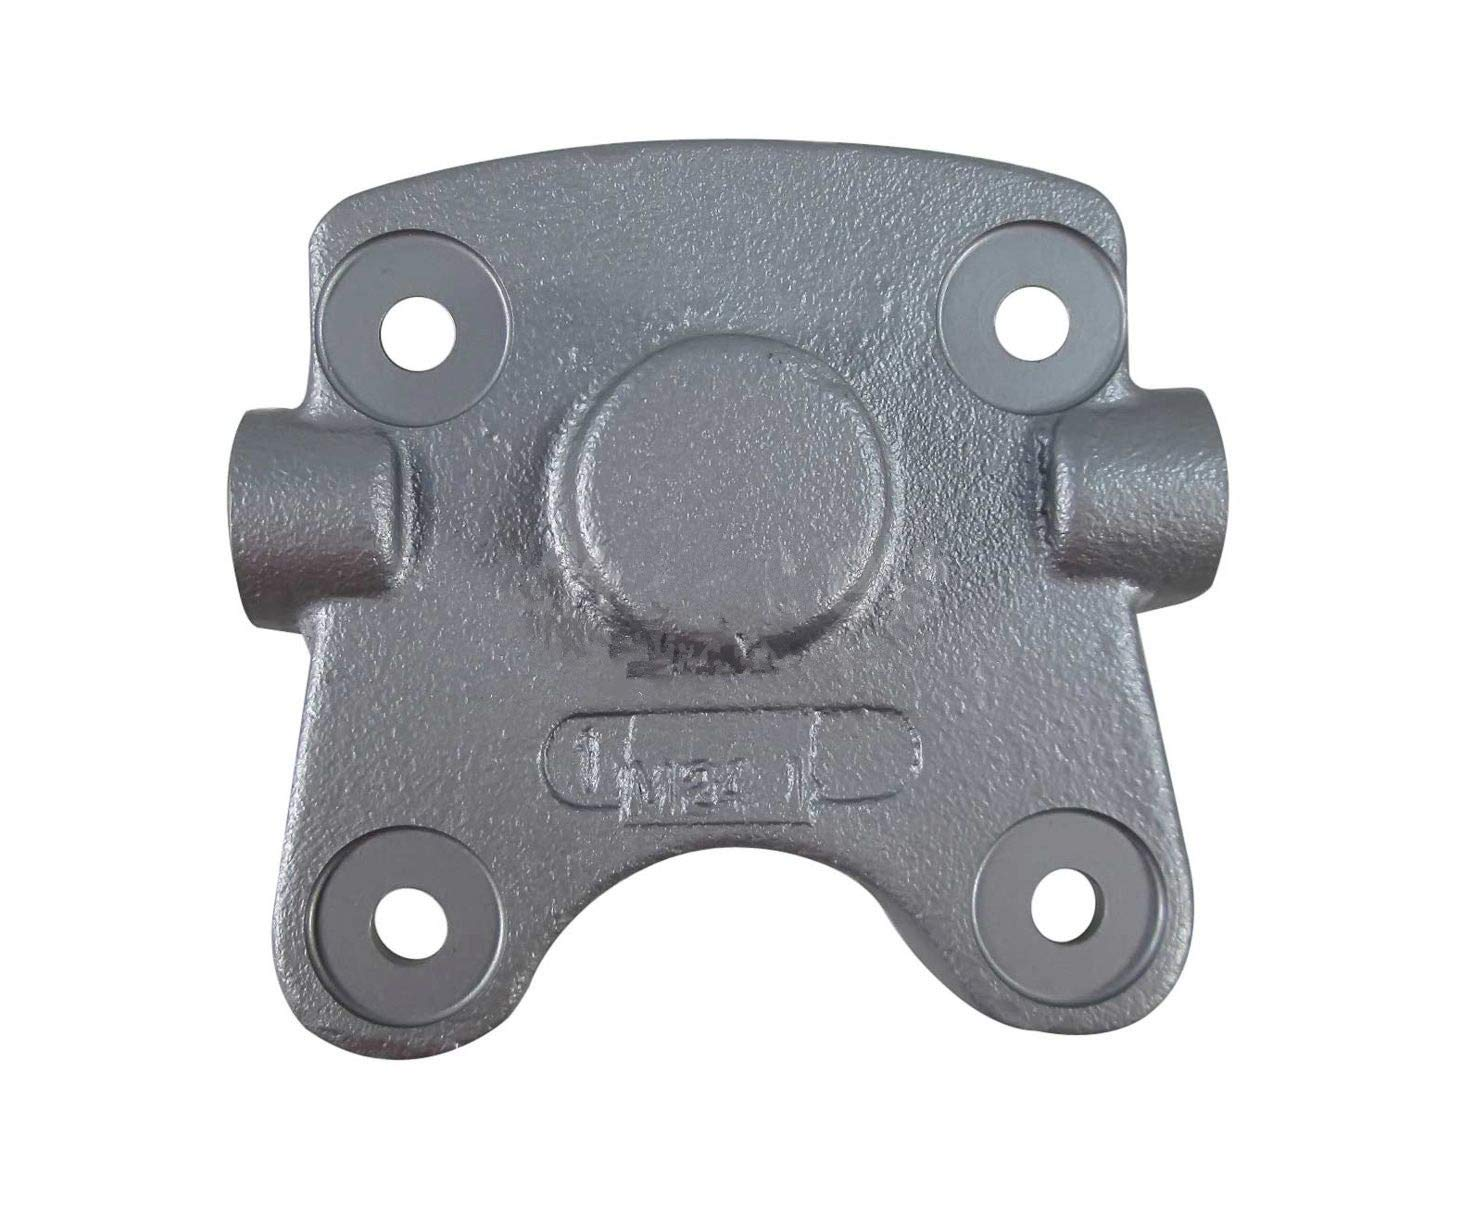 Cleveland Wheel & Brake 061-11800 Cylinder by Cleveland Wheel & Brake